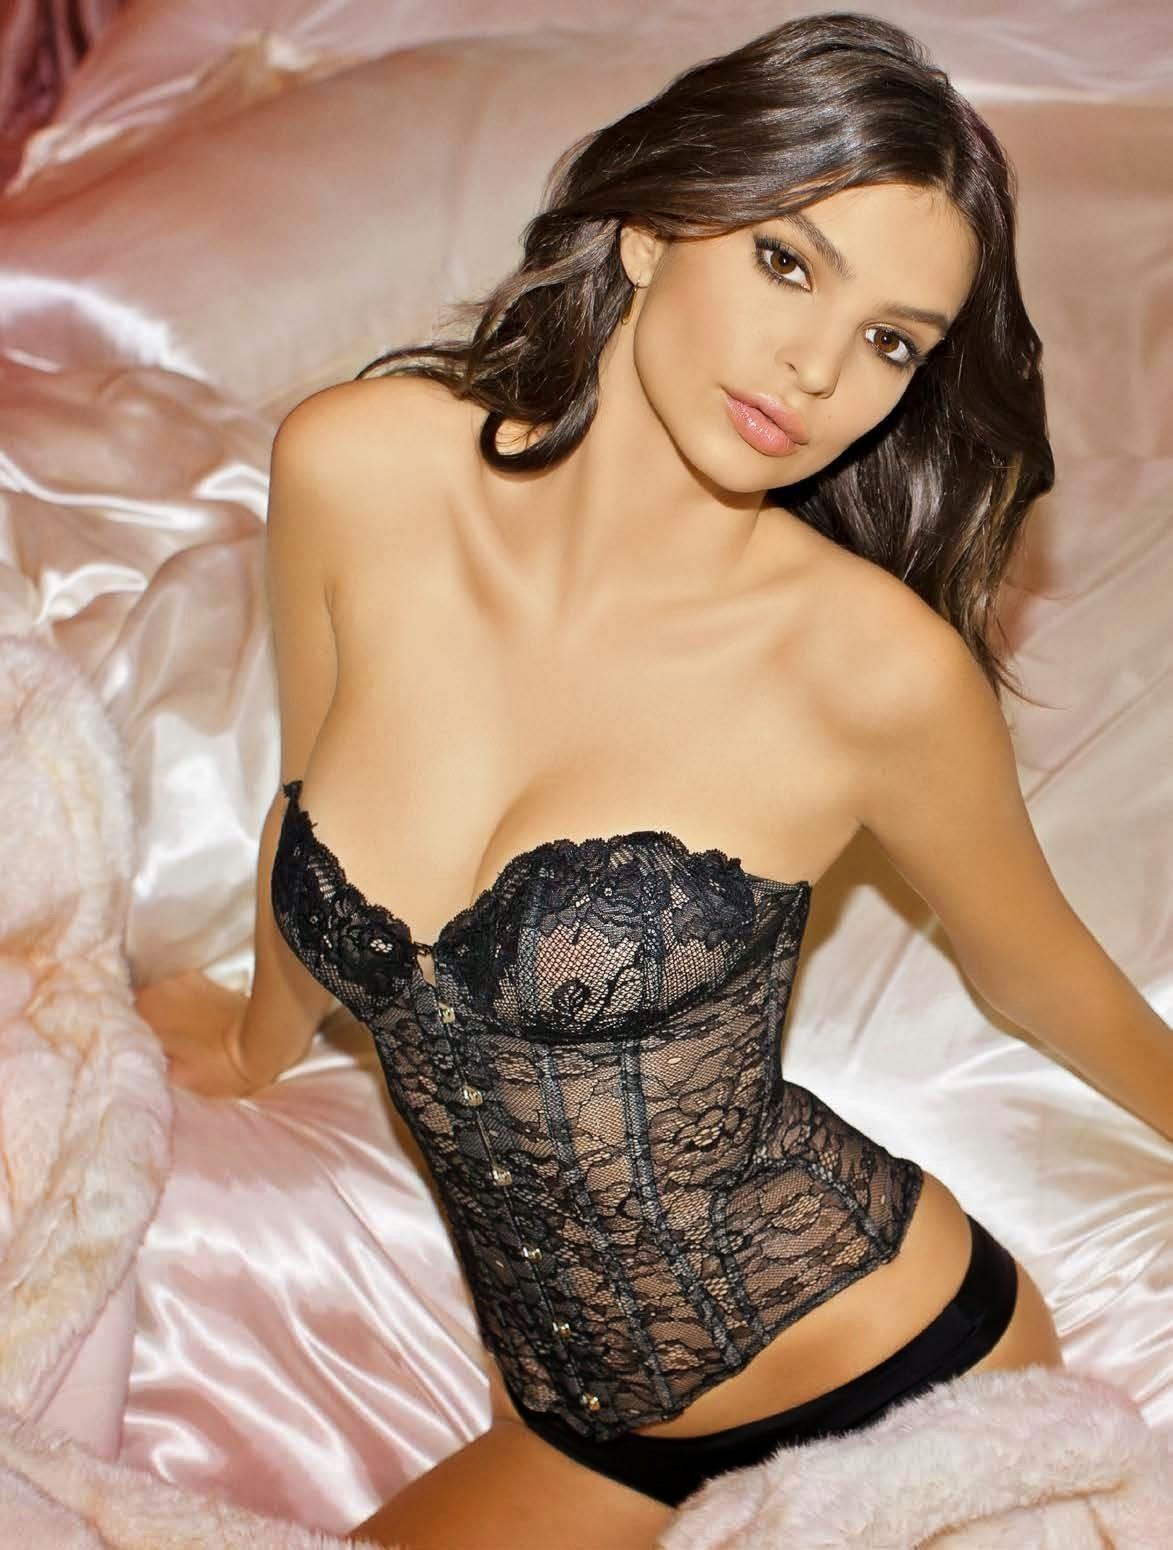 Valerie cruz nude pics 3